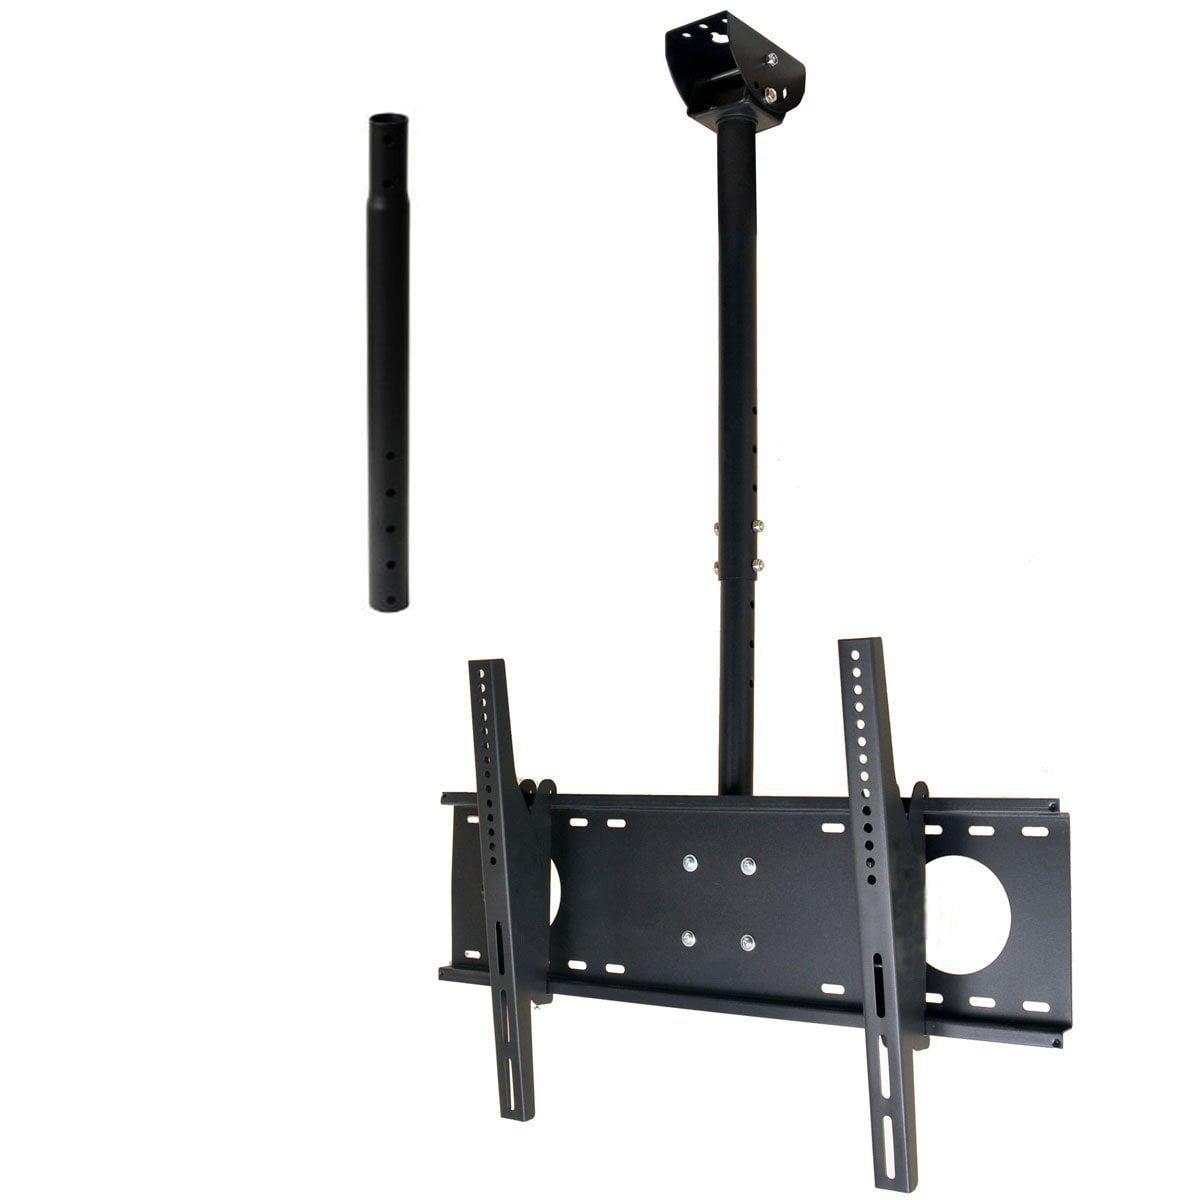 Secu Tilt Pan Tv Ceiling Mount For Samsung 39 65 Lcd Led Plasma Hdtv Uhd Un65ju640dfxza Un75f6400afxza Bwd Com